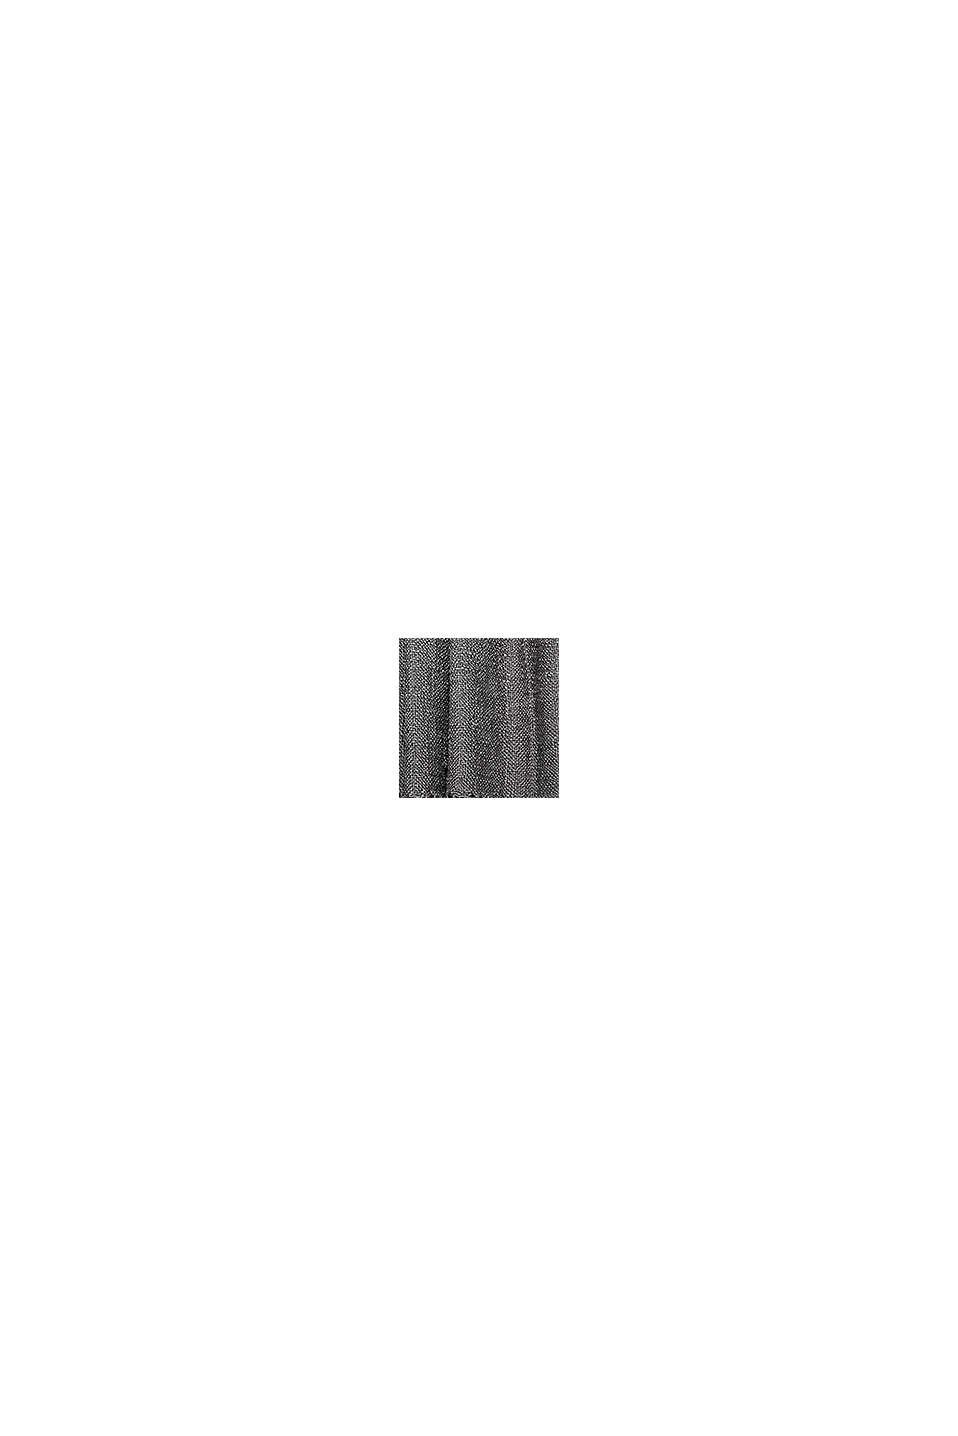 Blød tekstilplaid med skinnende garn, ANTHRACITE, swatch